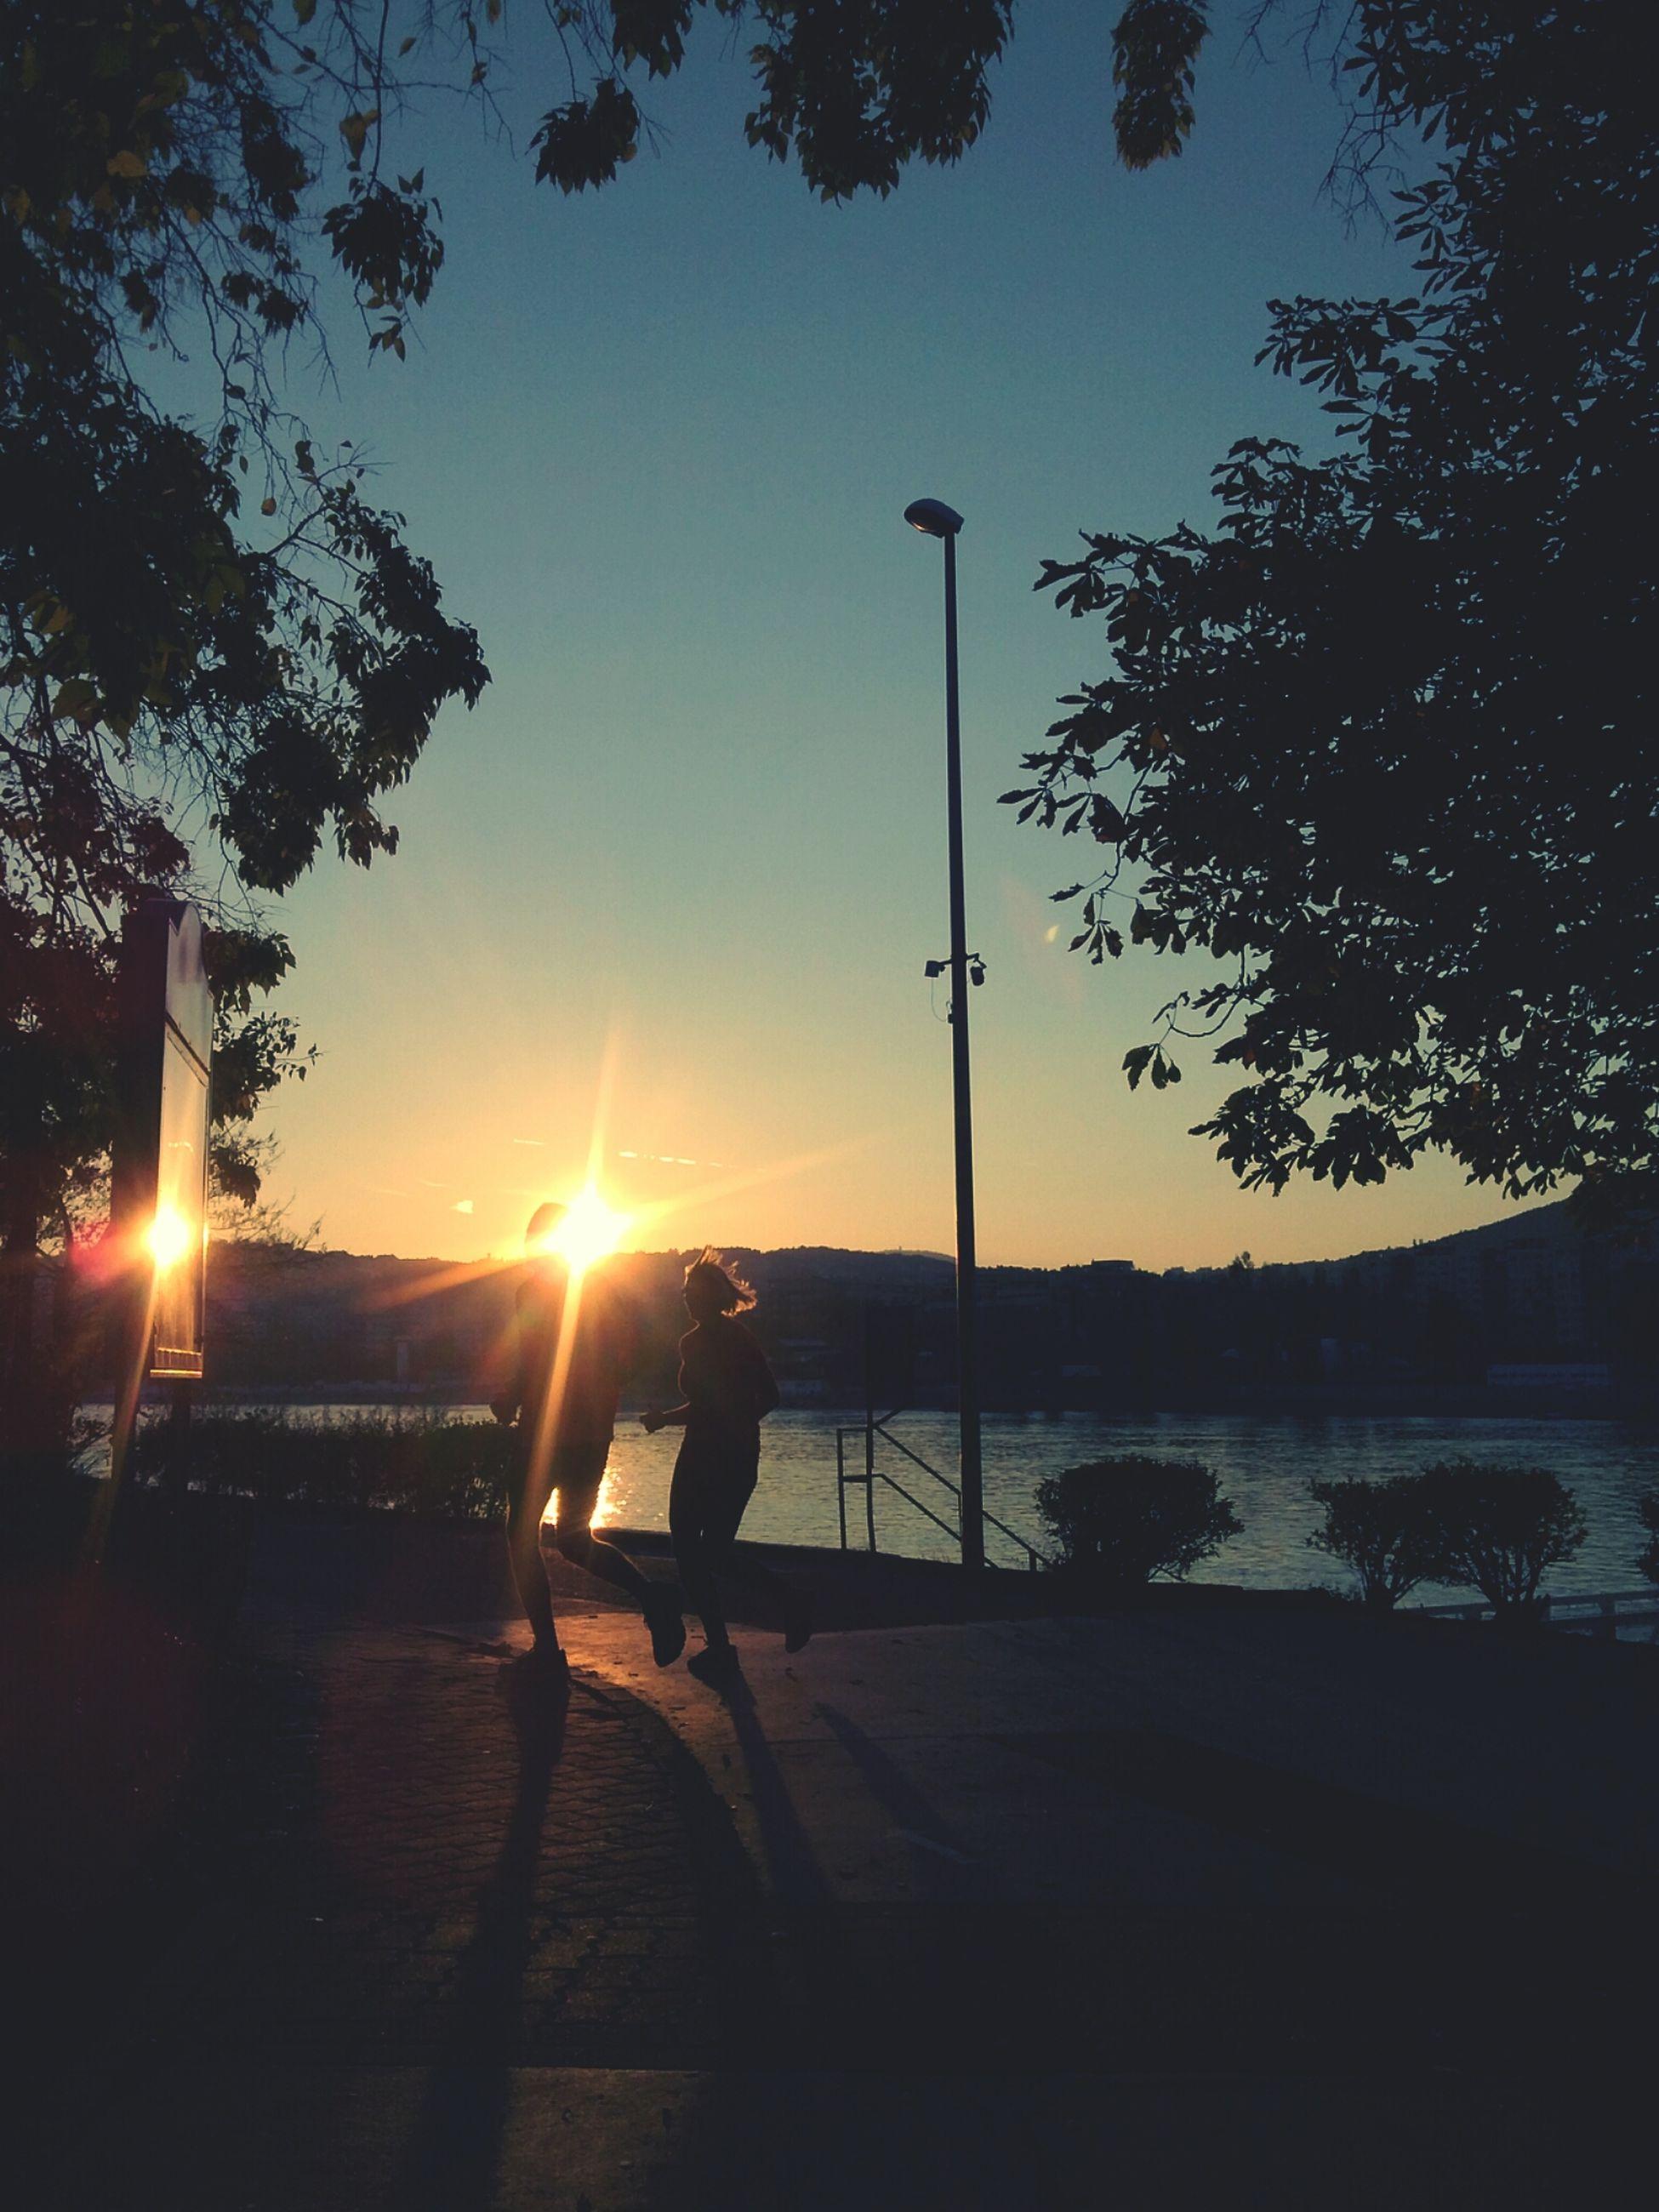 sun, sunset, tree, silhouette, sunlight, sunbeam, lens flare, street light, tranquility, clear sky, sky, tranquil scene, water, nature, beauty in nature, scenics, transportation, orange color, railing, outdoors